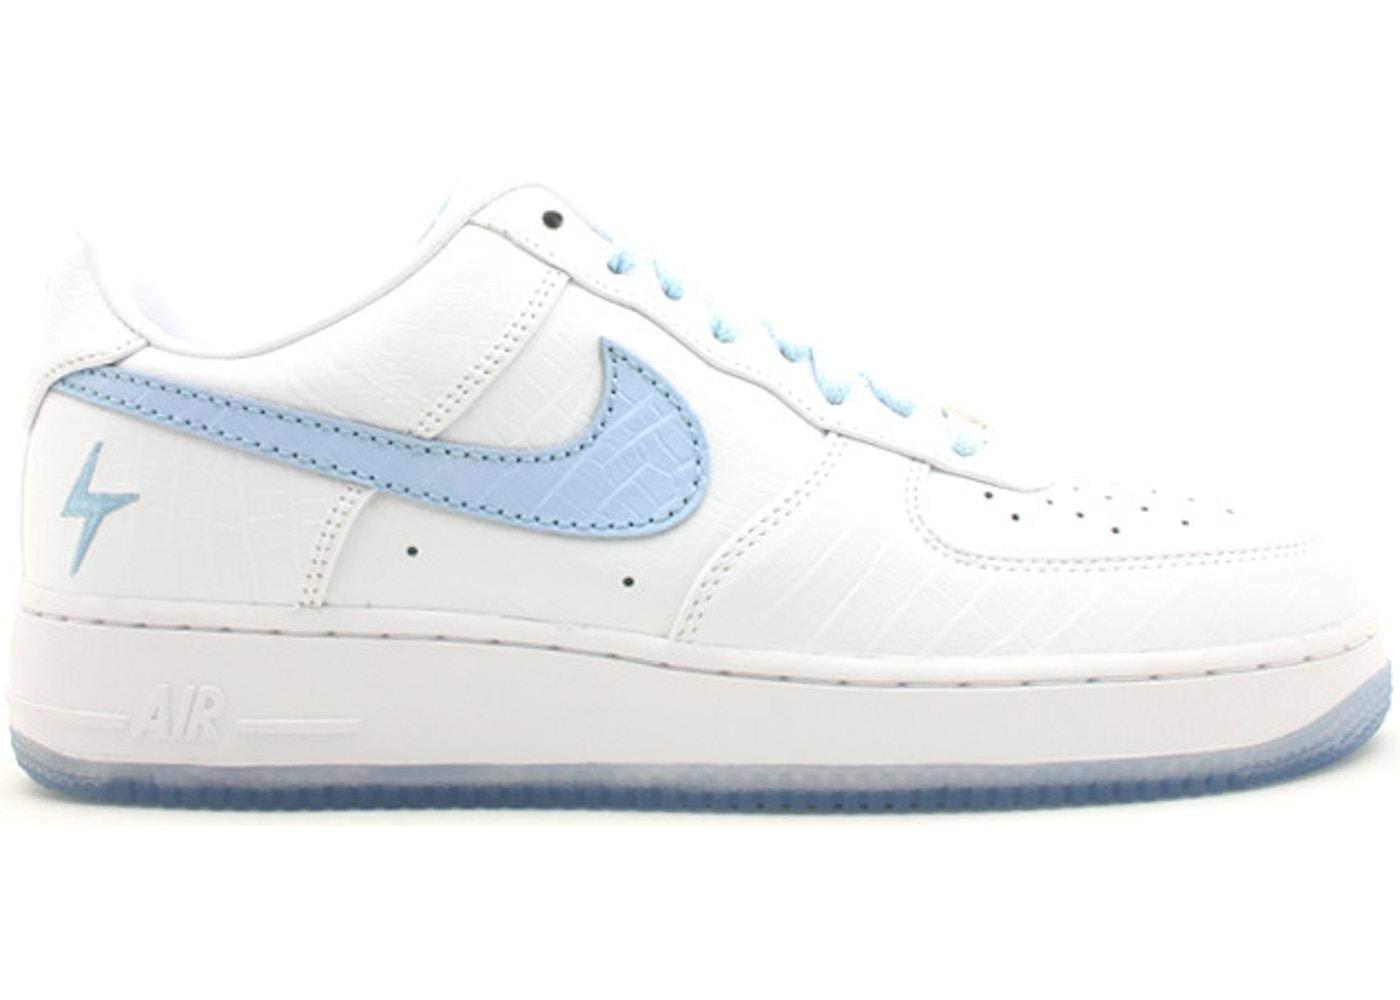 various colors 9de2e a7e0c ... LaDainian Tomlinson 1World  Nike Air Force 1 Shoes - New Highest Bids  ...